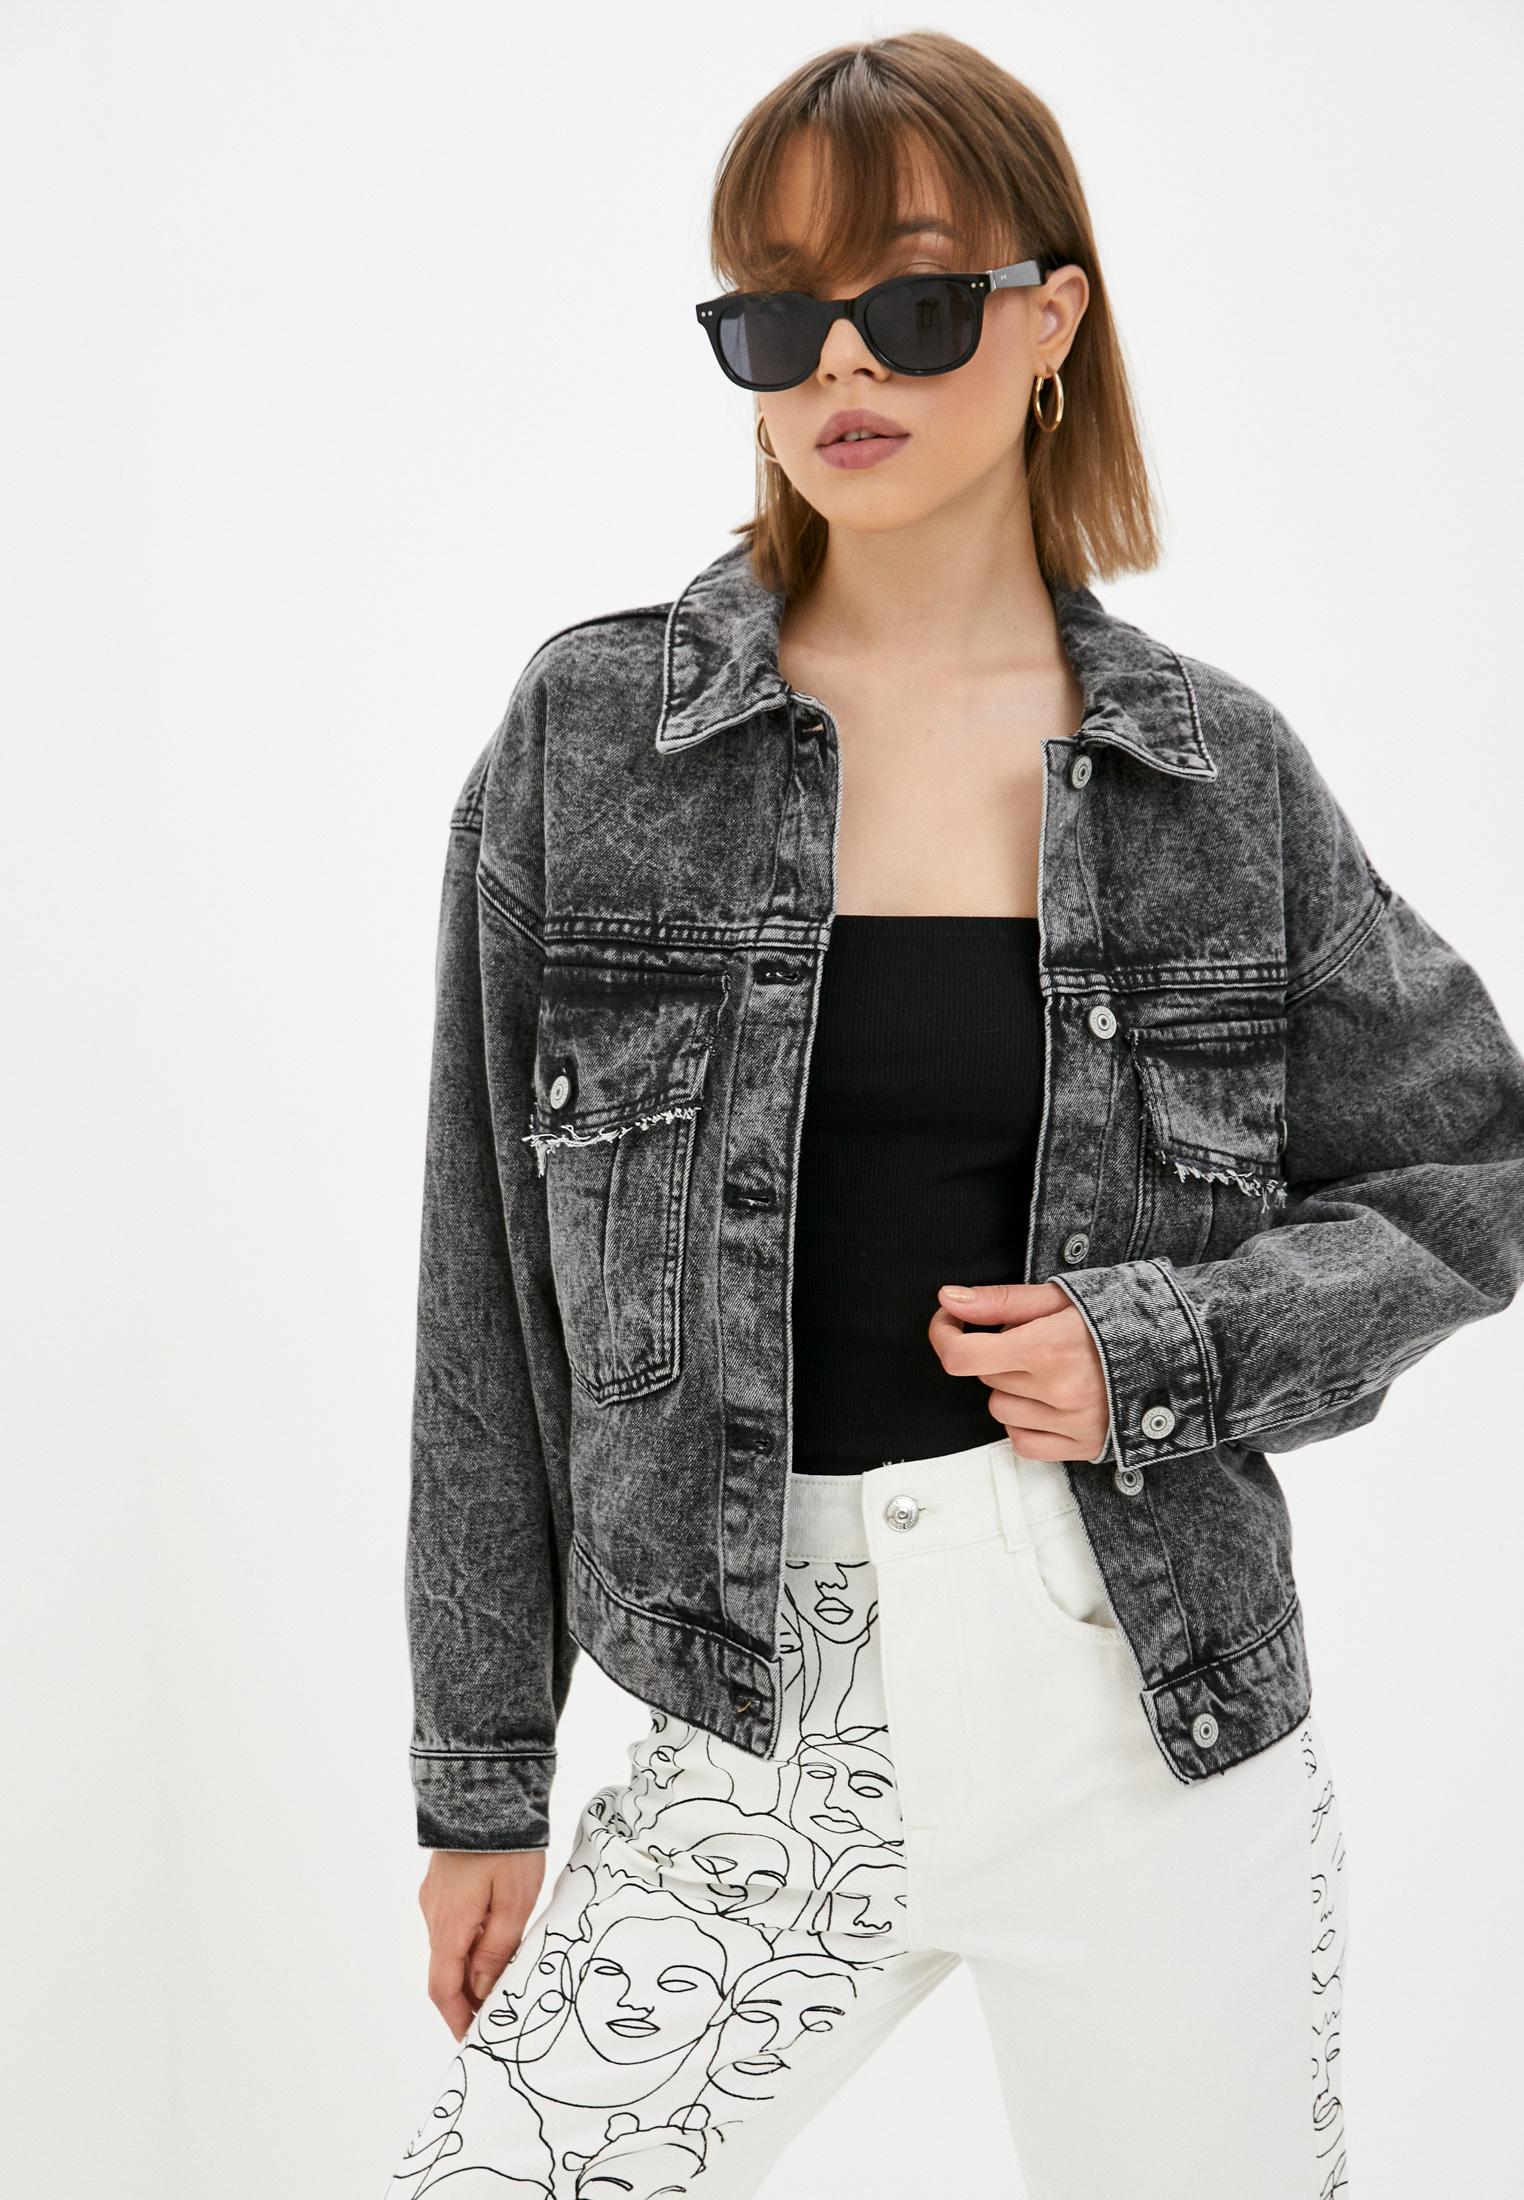 Джинсовая куртка Pimkie Куртка джинсовая Pimkie